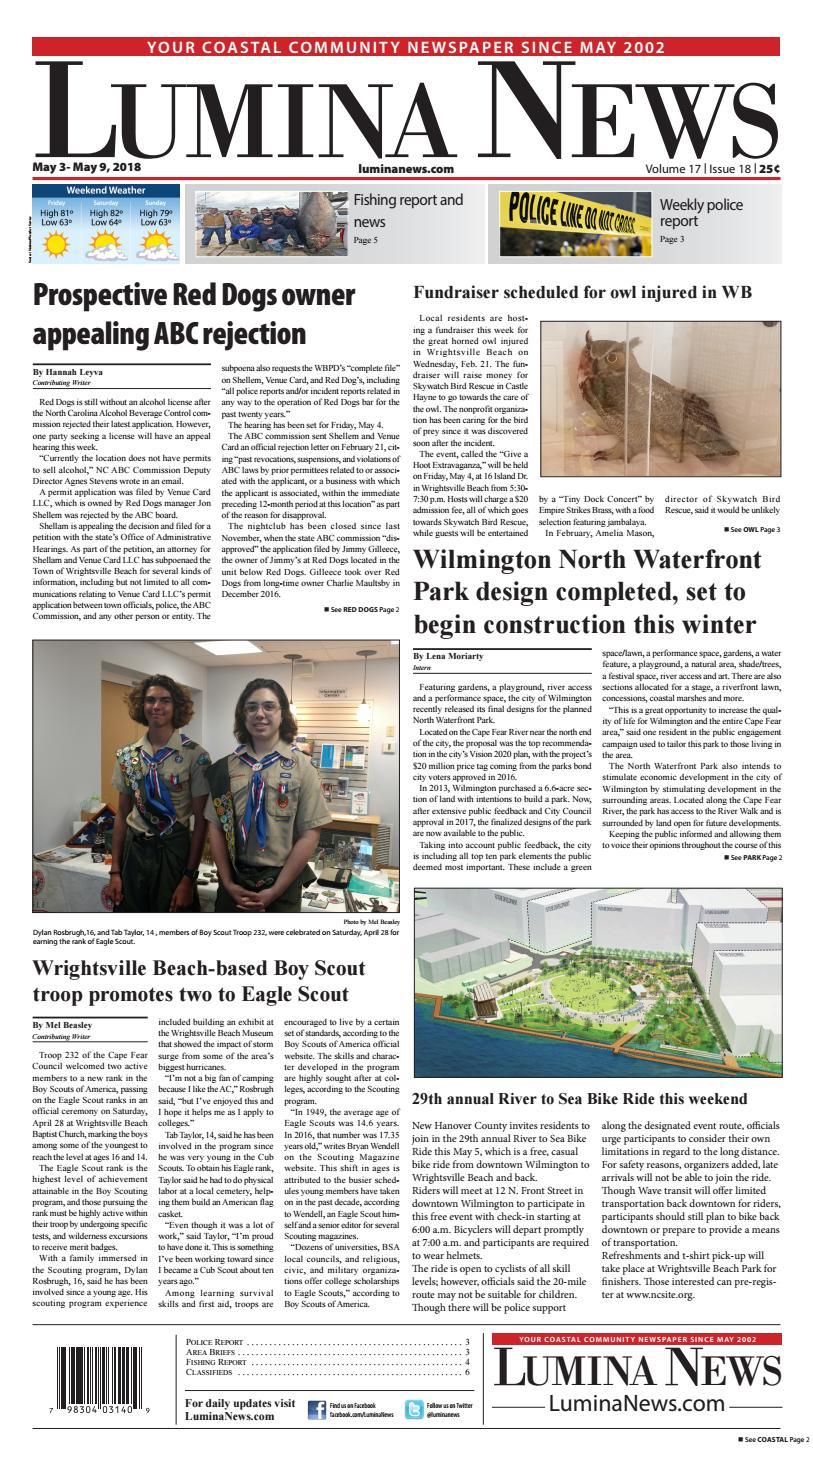 Lumina News May 3, 2018 by Lumina News - issuu